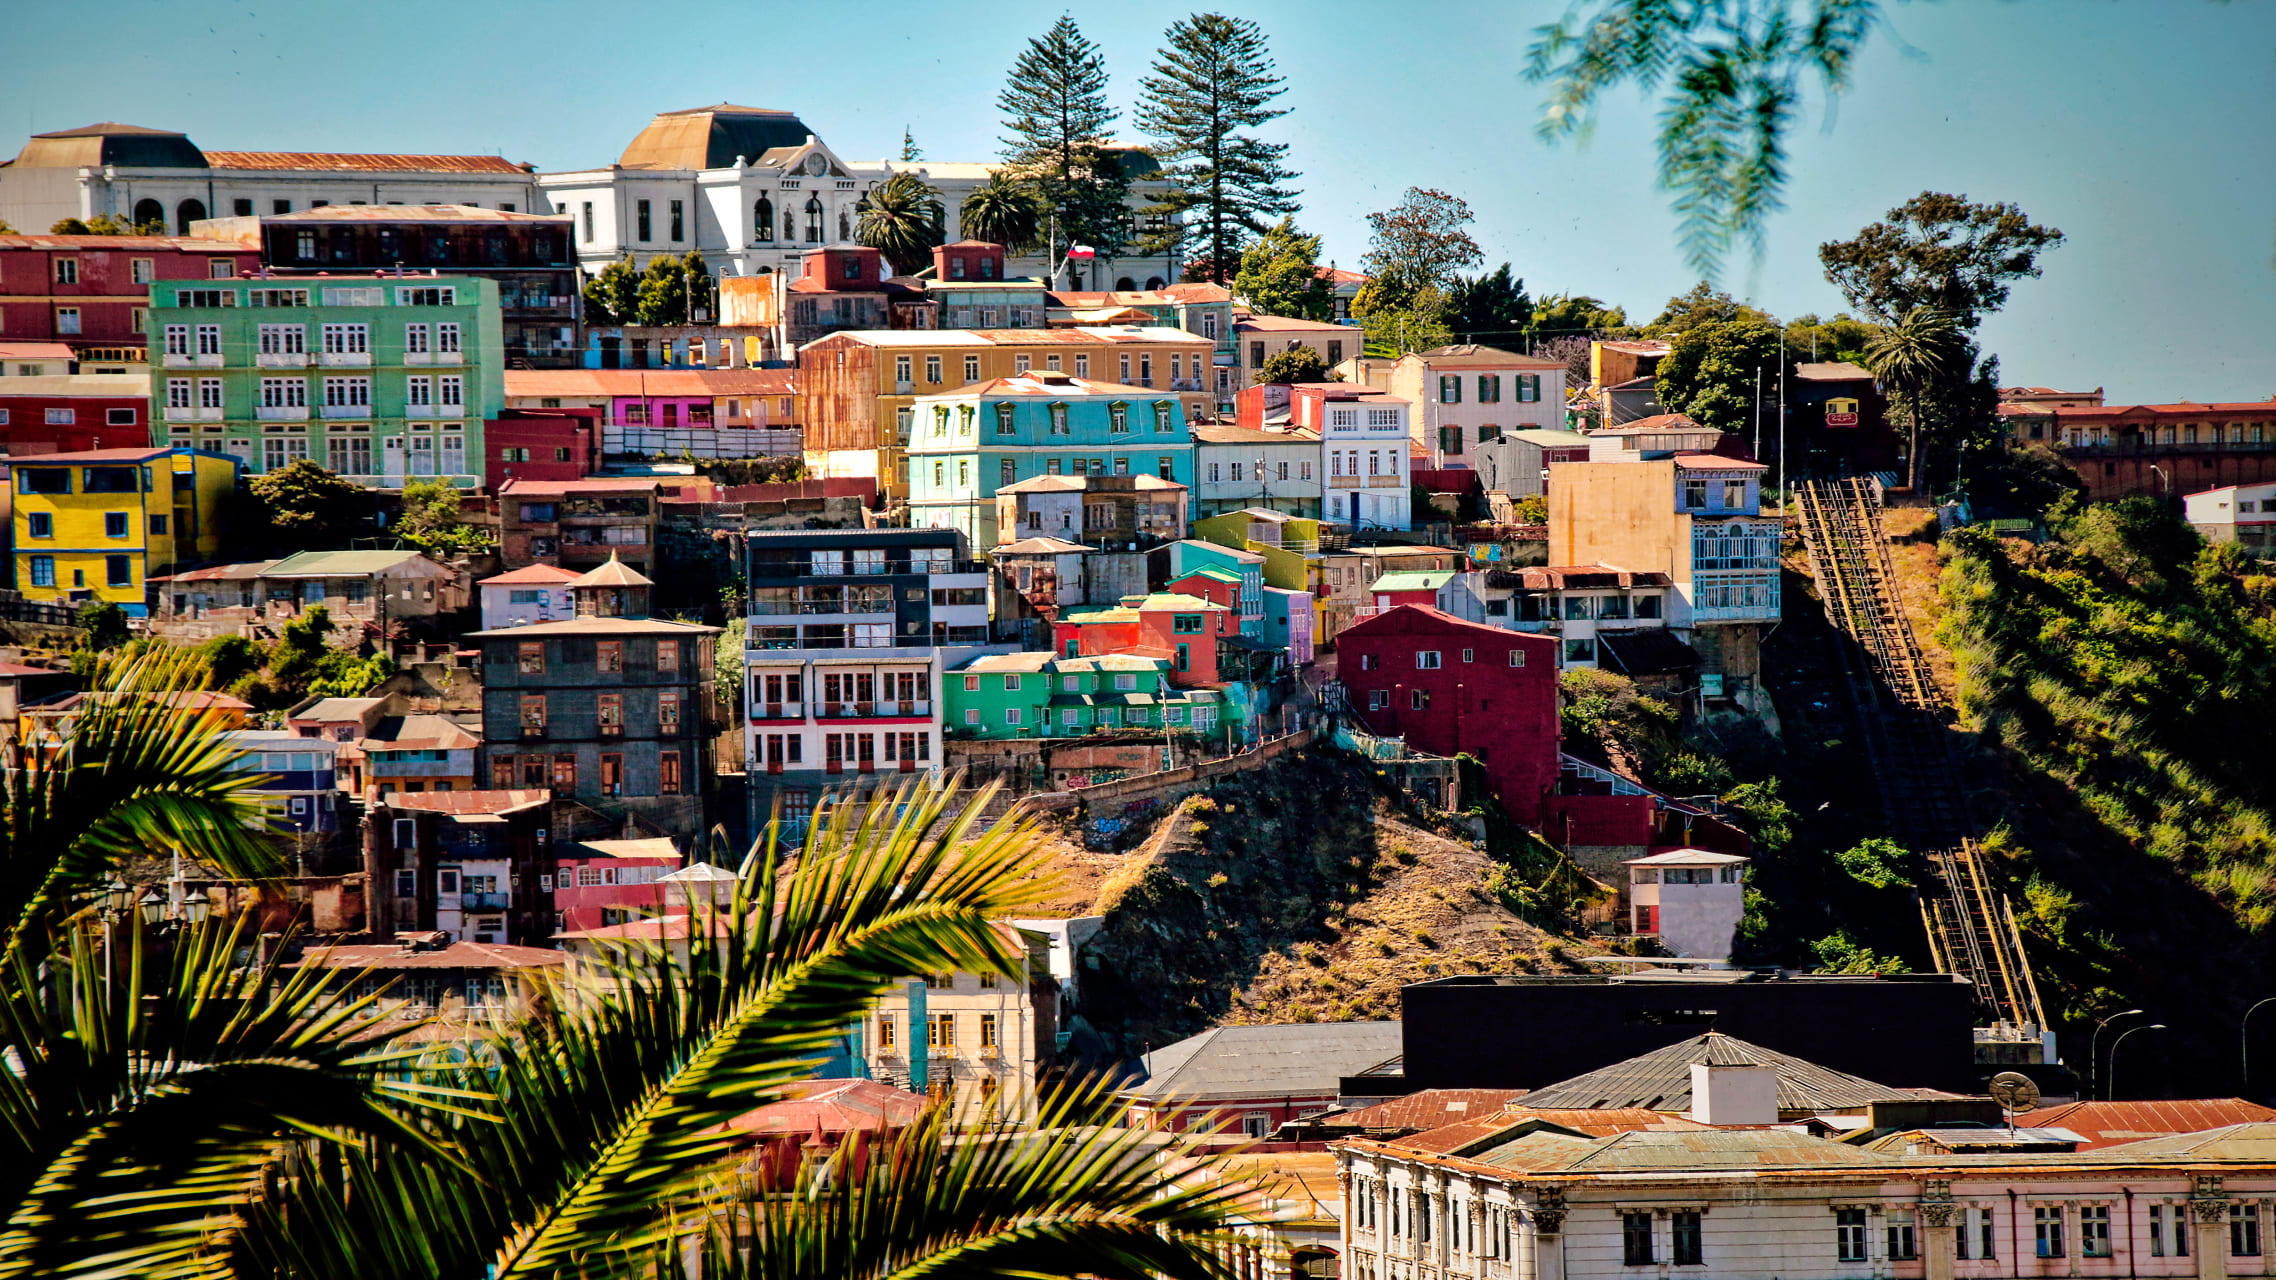 Valparaiso cover image